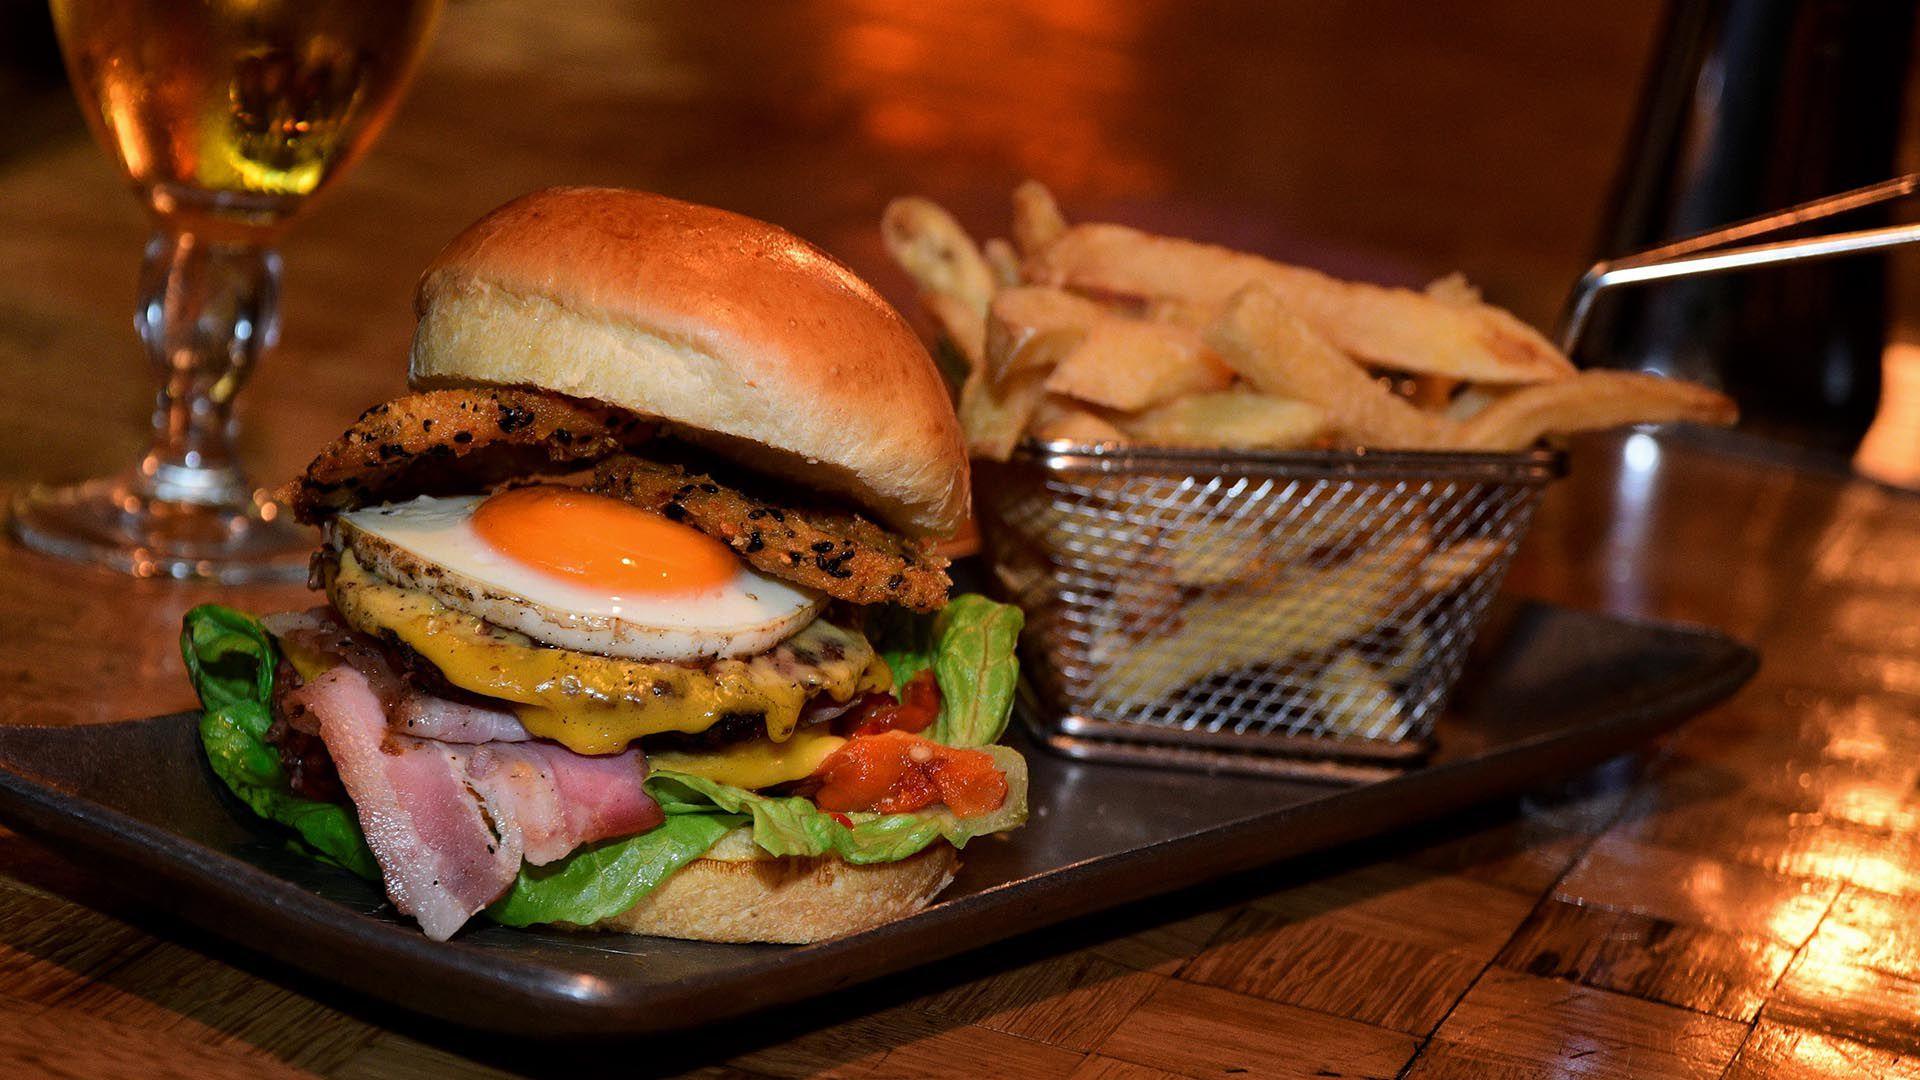 Una hamburguesa completa. Con panceta, cheddar, huevo frito, lechuga y tomate